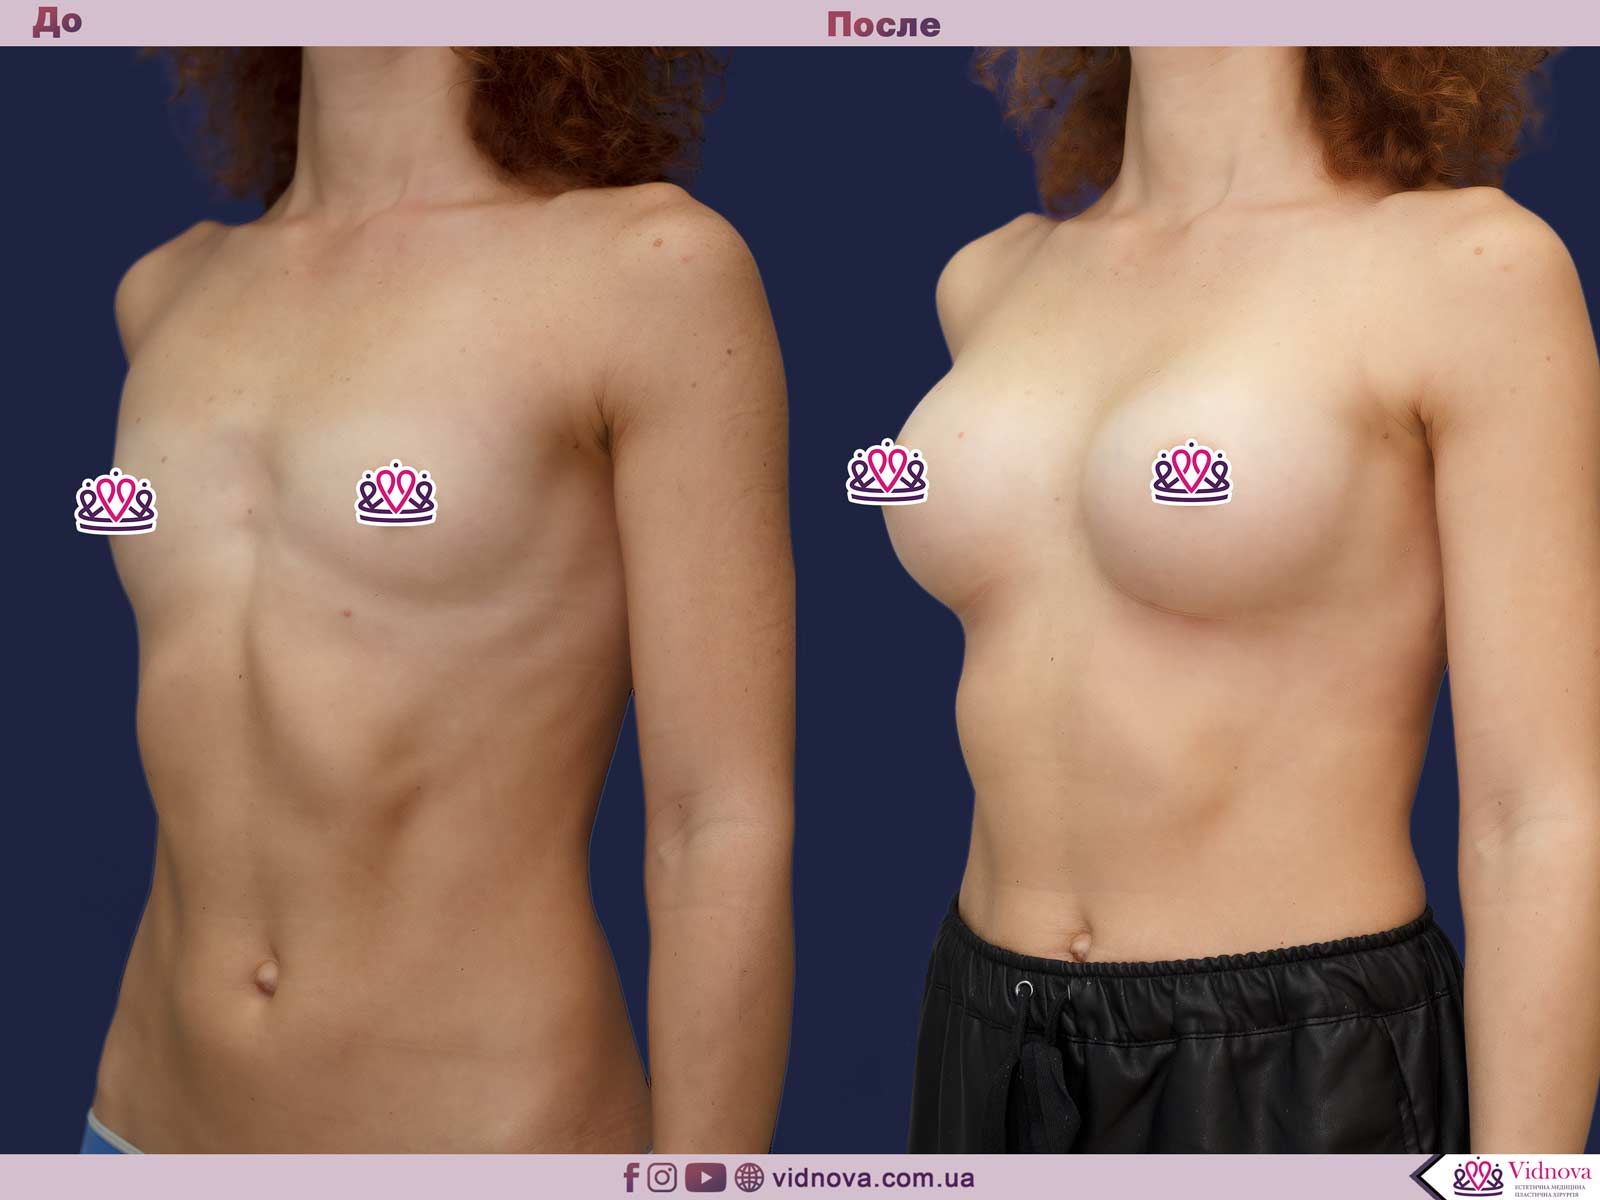 Увеличение груди: Фото ДО и ПОСЛЕ - Пример №70-2 - Клиника Vidnova